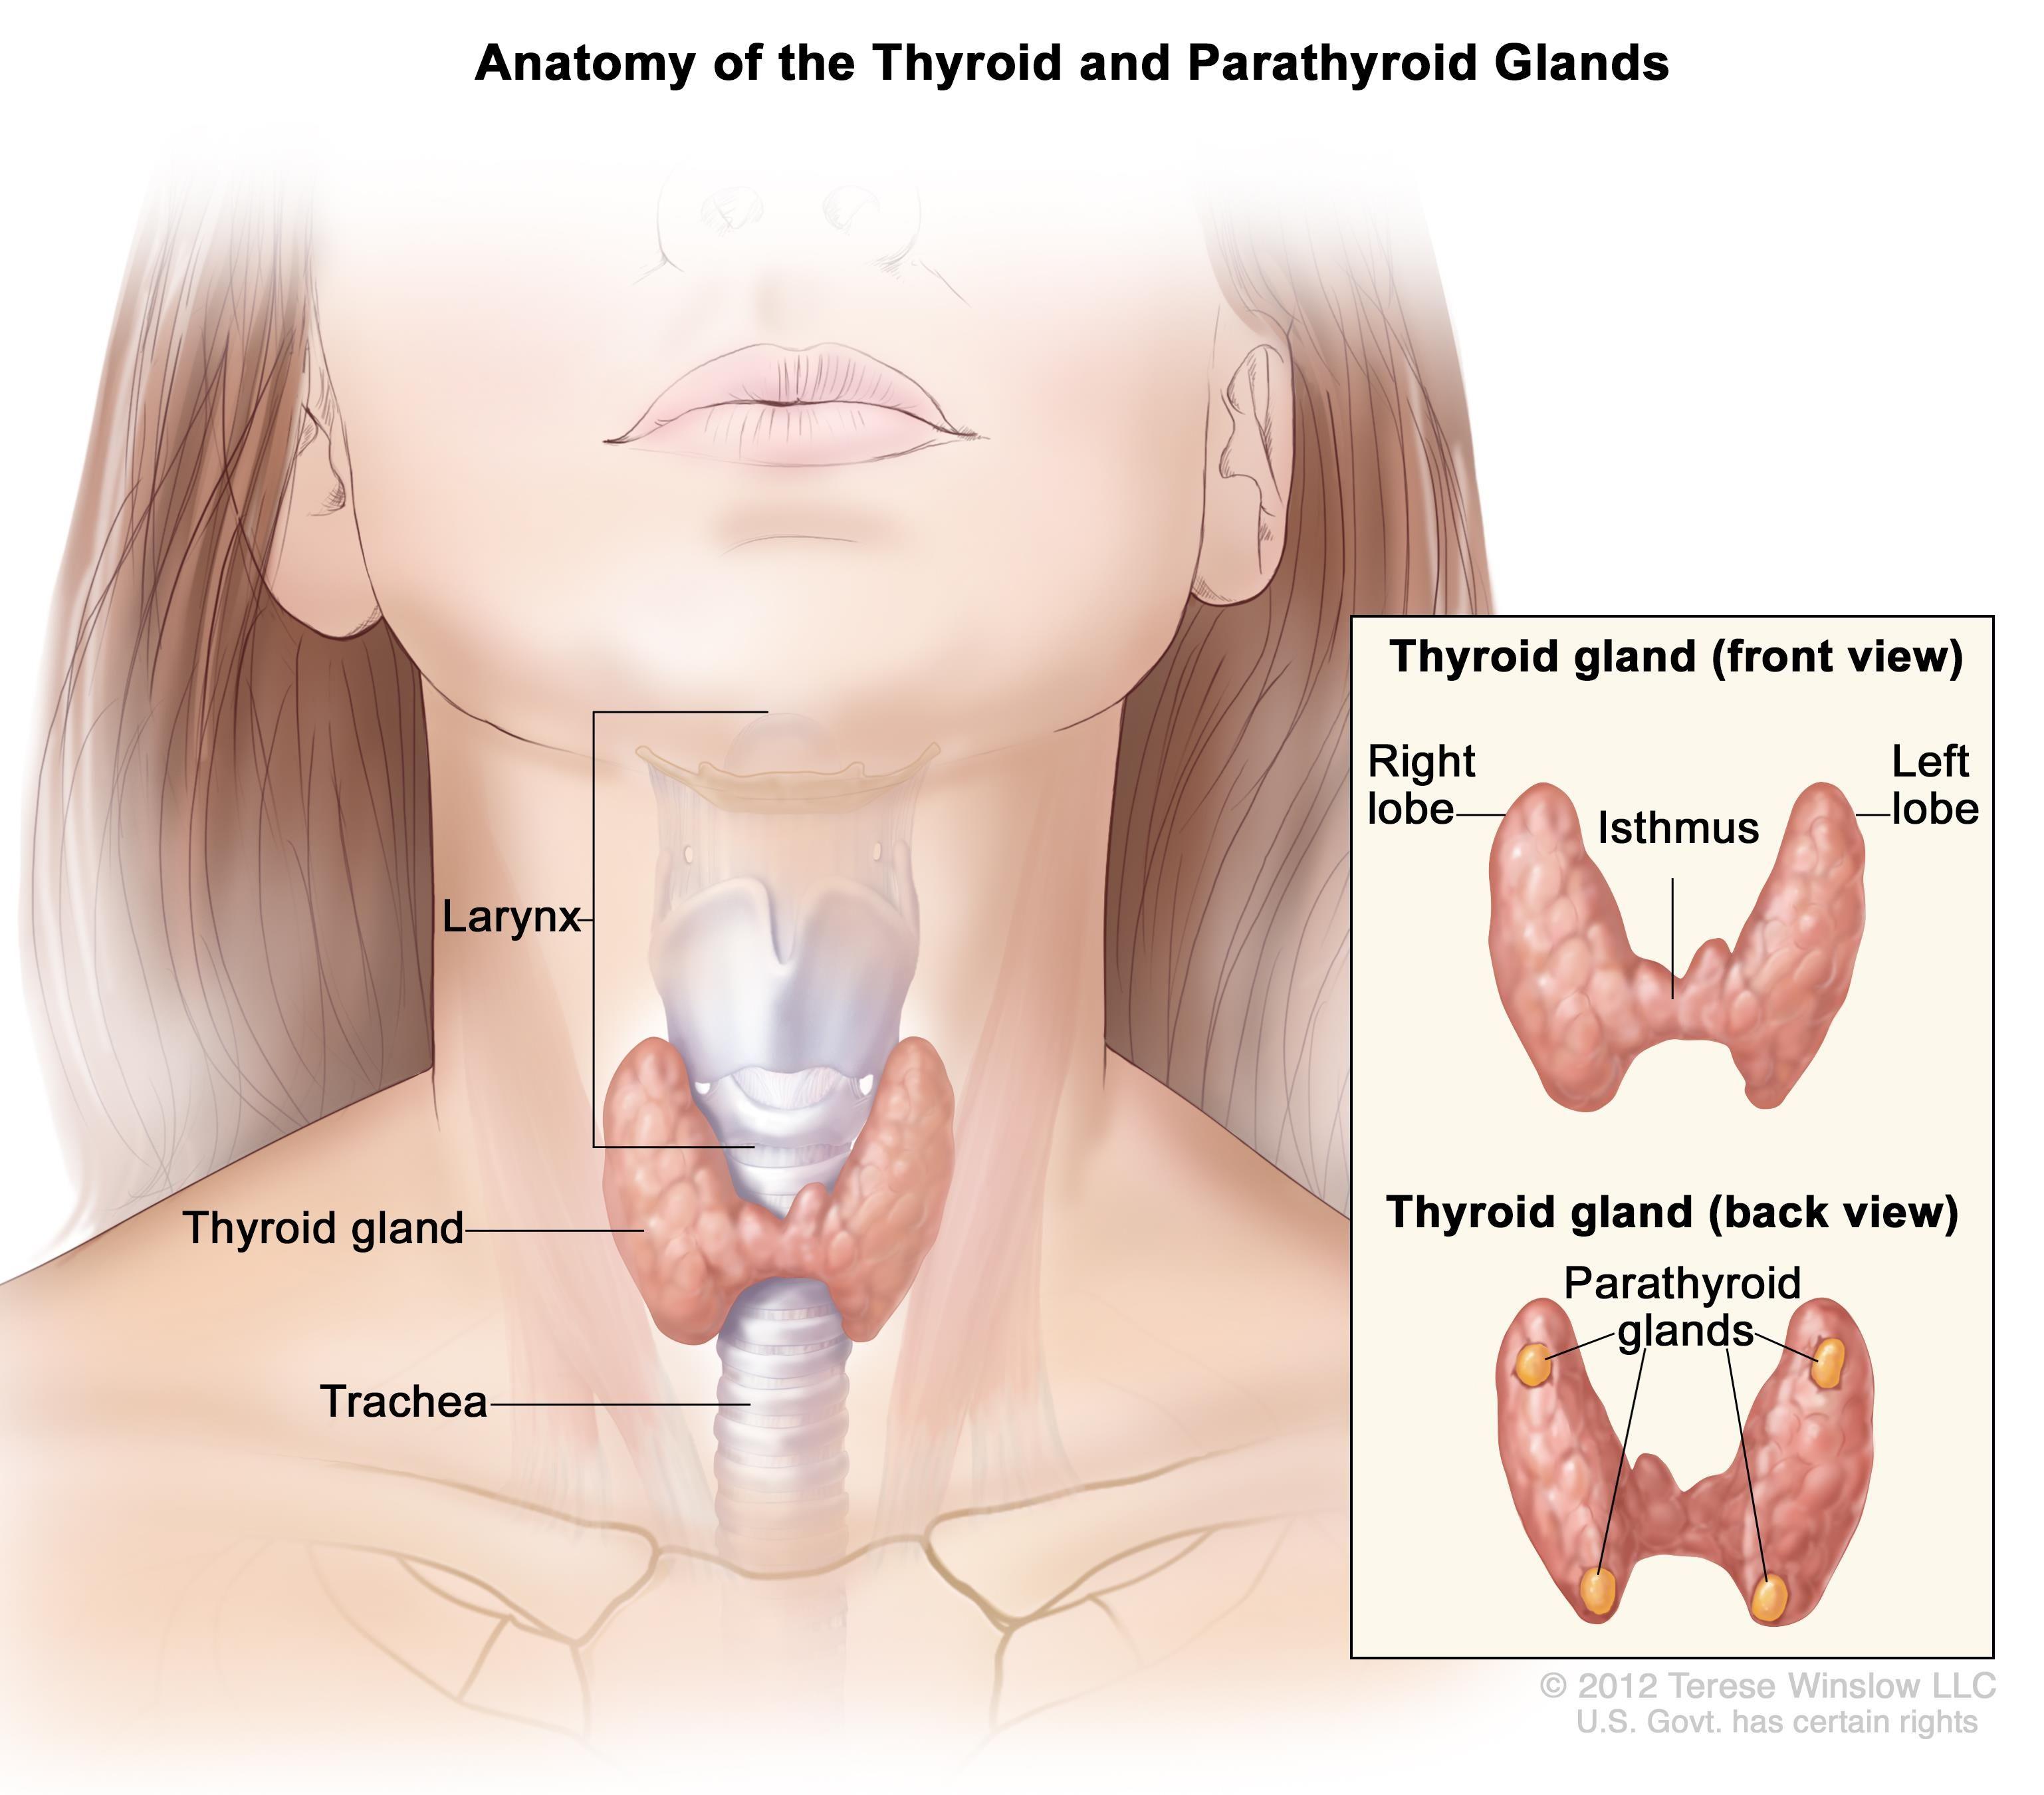 Anatomy Of Thyroid Gland And Parathyroid Glands Endocrine System